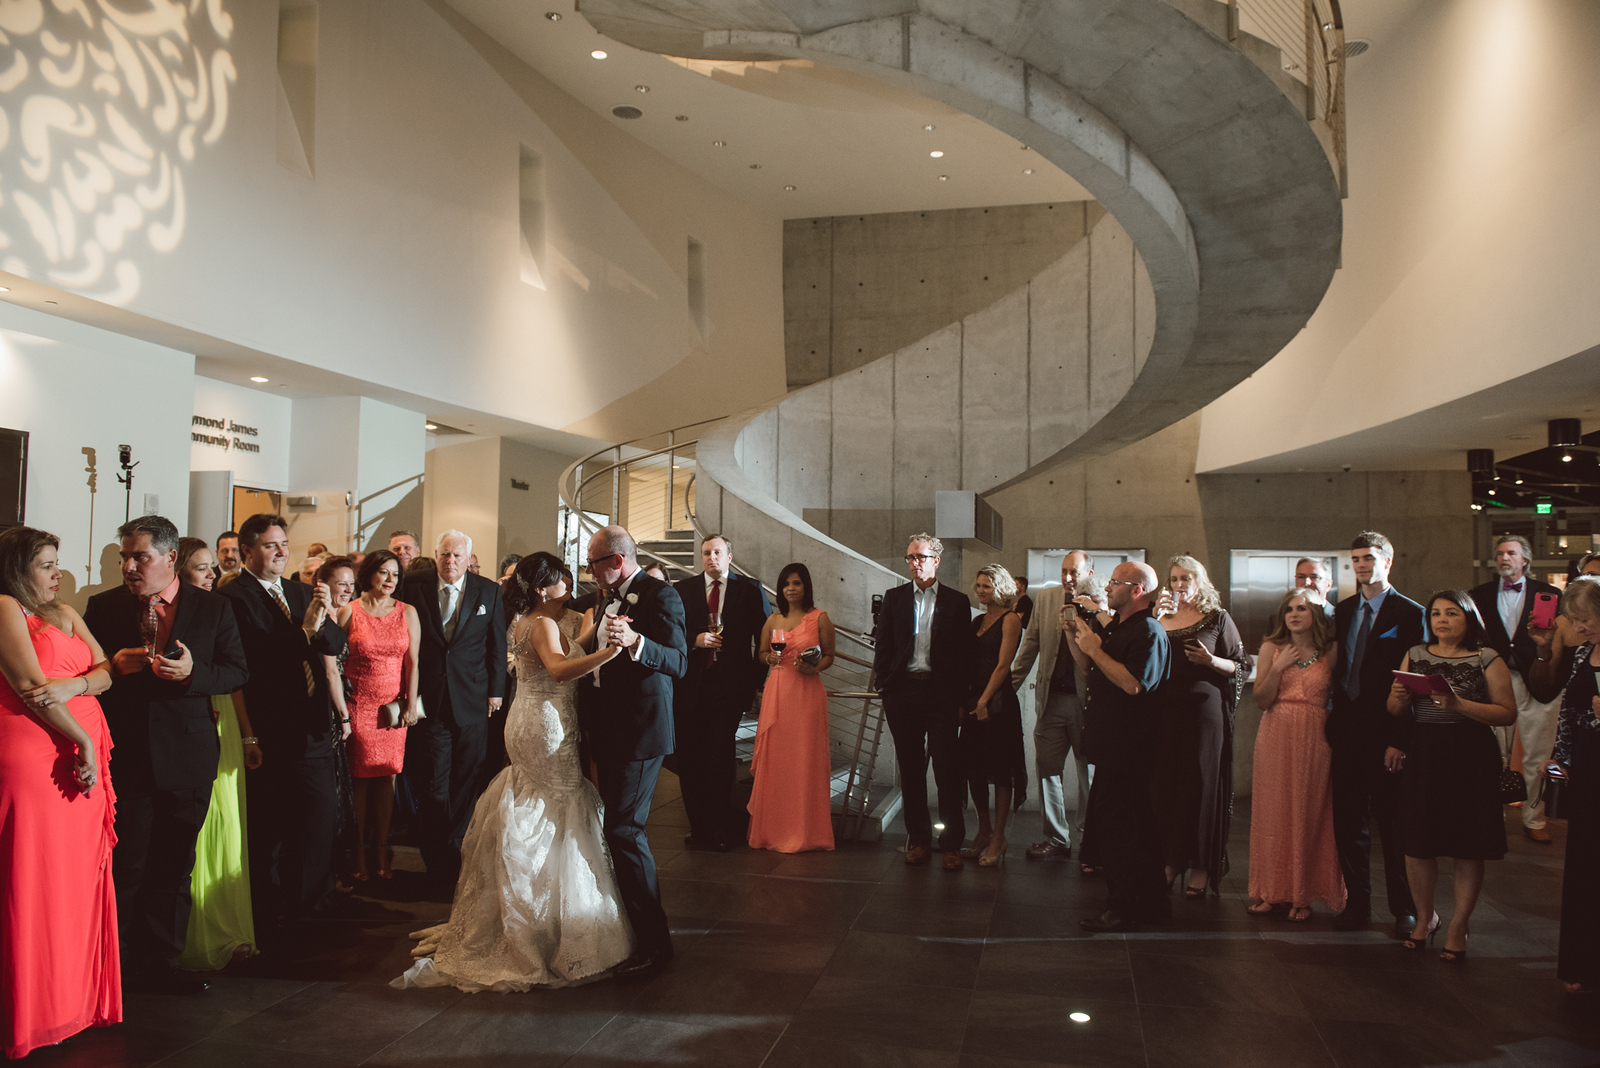 2016-0606-dali-wedding-photographer-2048x-991